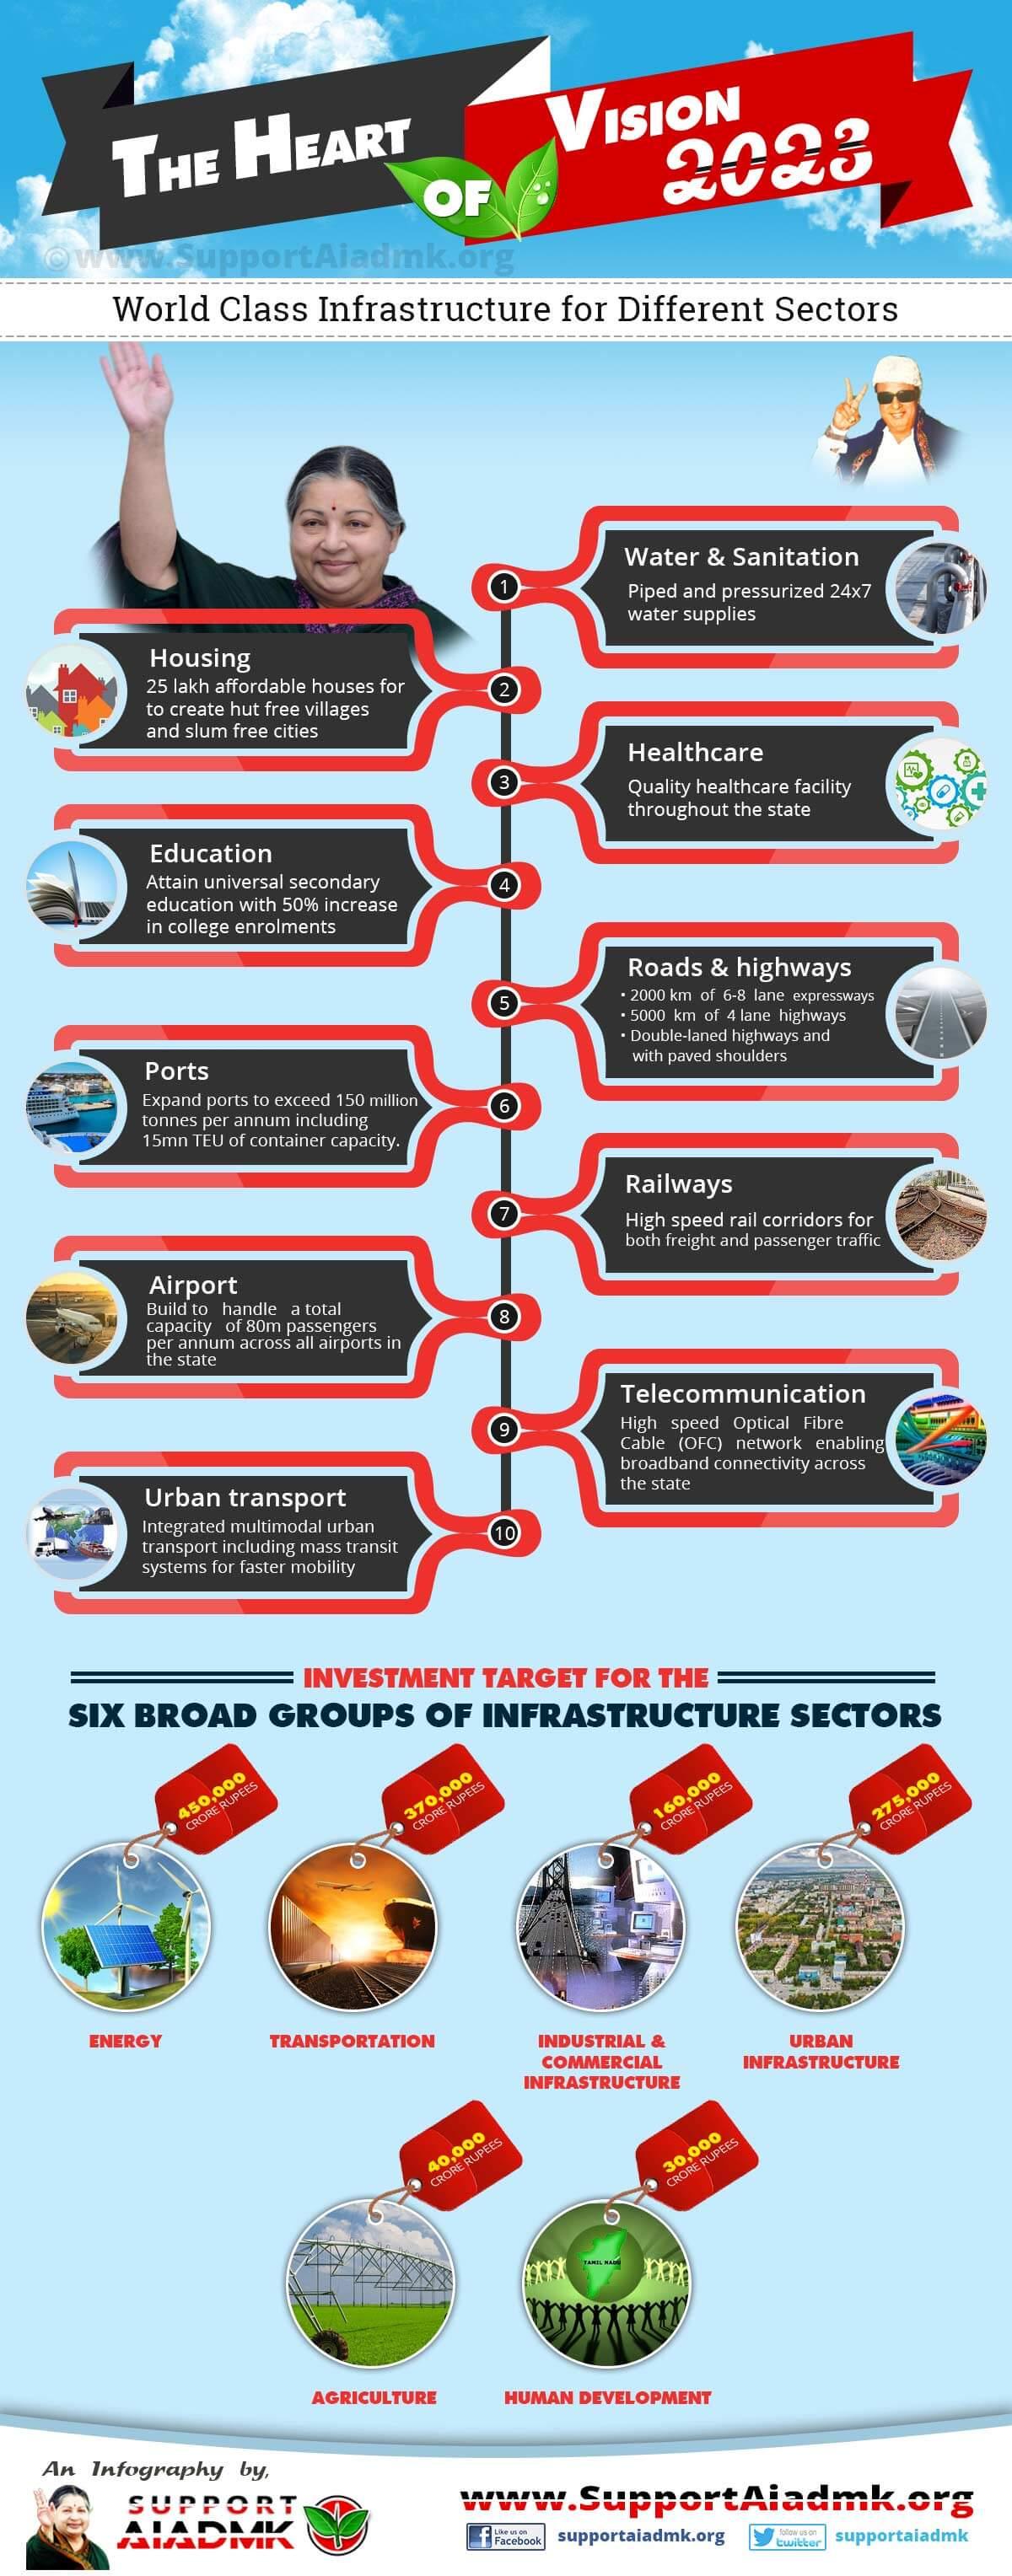 Infrastructural Development Plan 2023